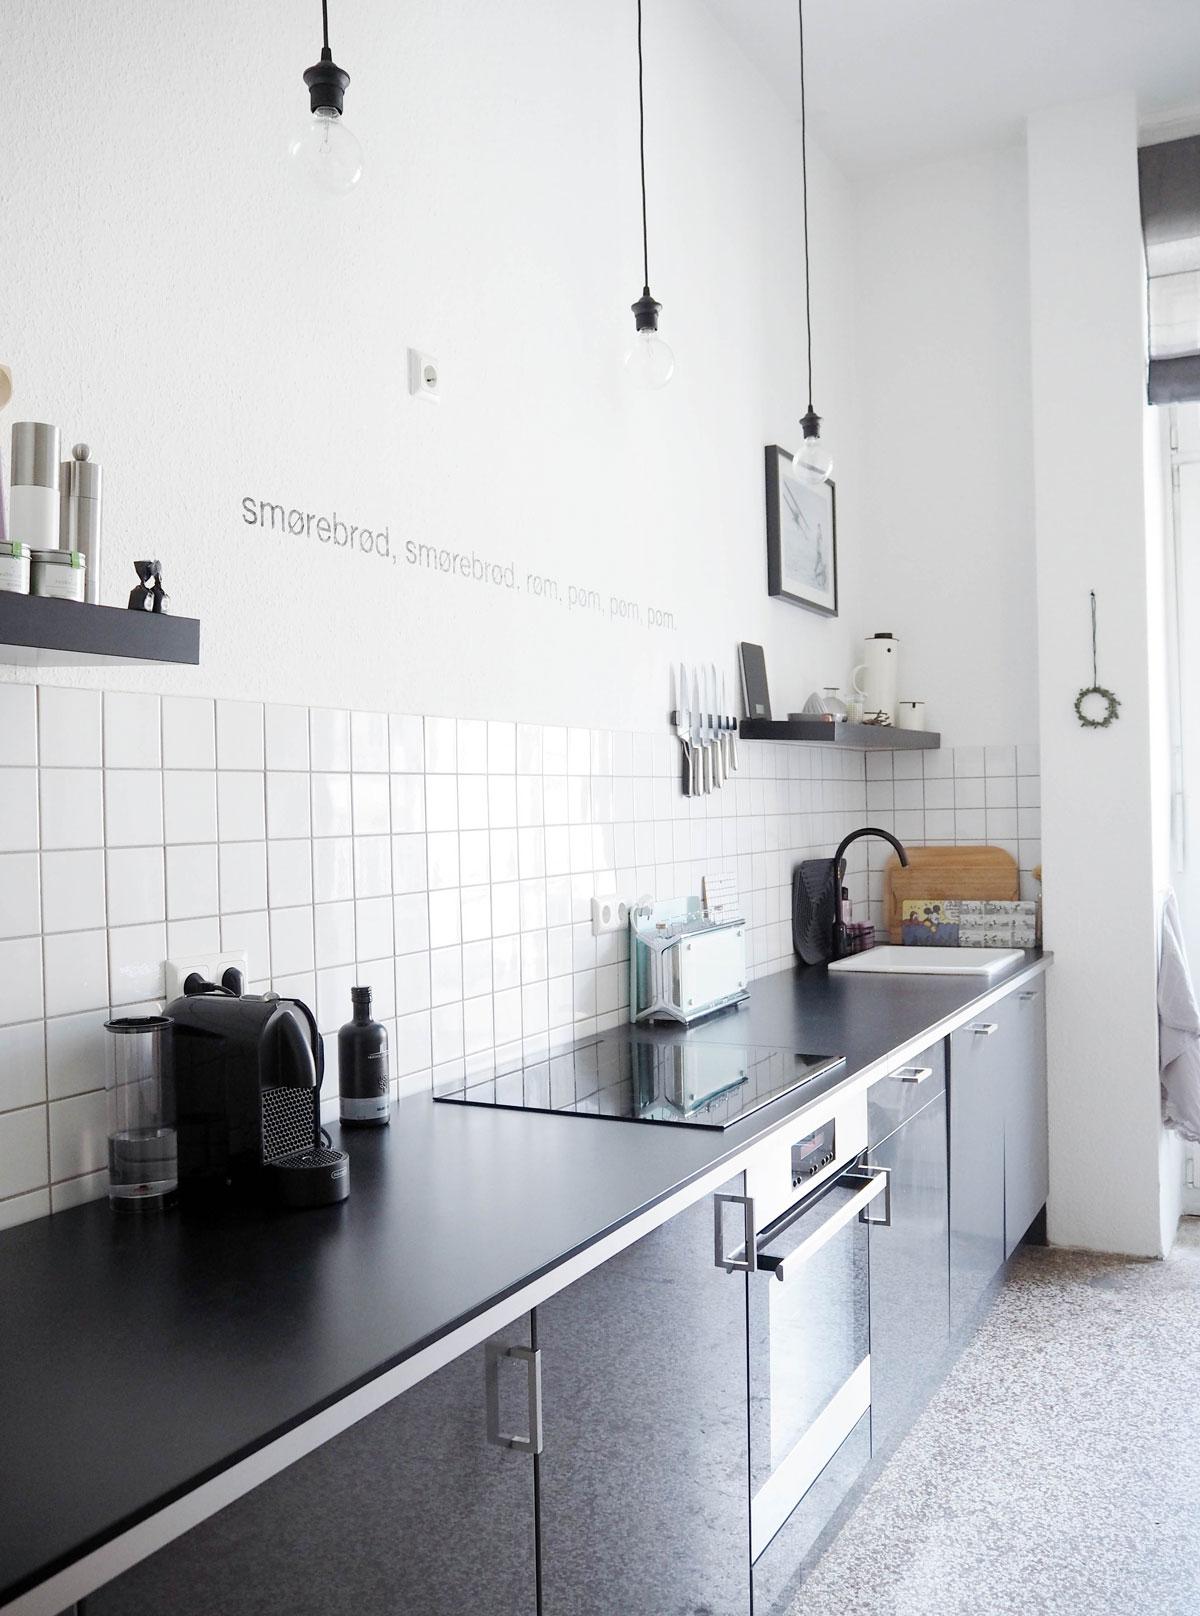 20170521 homestory lieblings blog wiesbaden christina schware k che. Black Bedroom Furniture Sets. Home Design Ideas